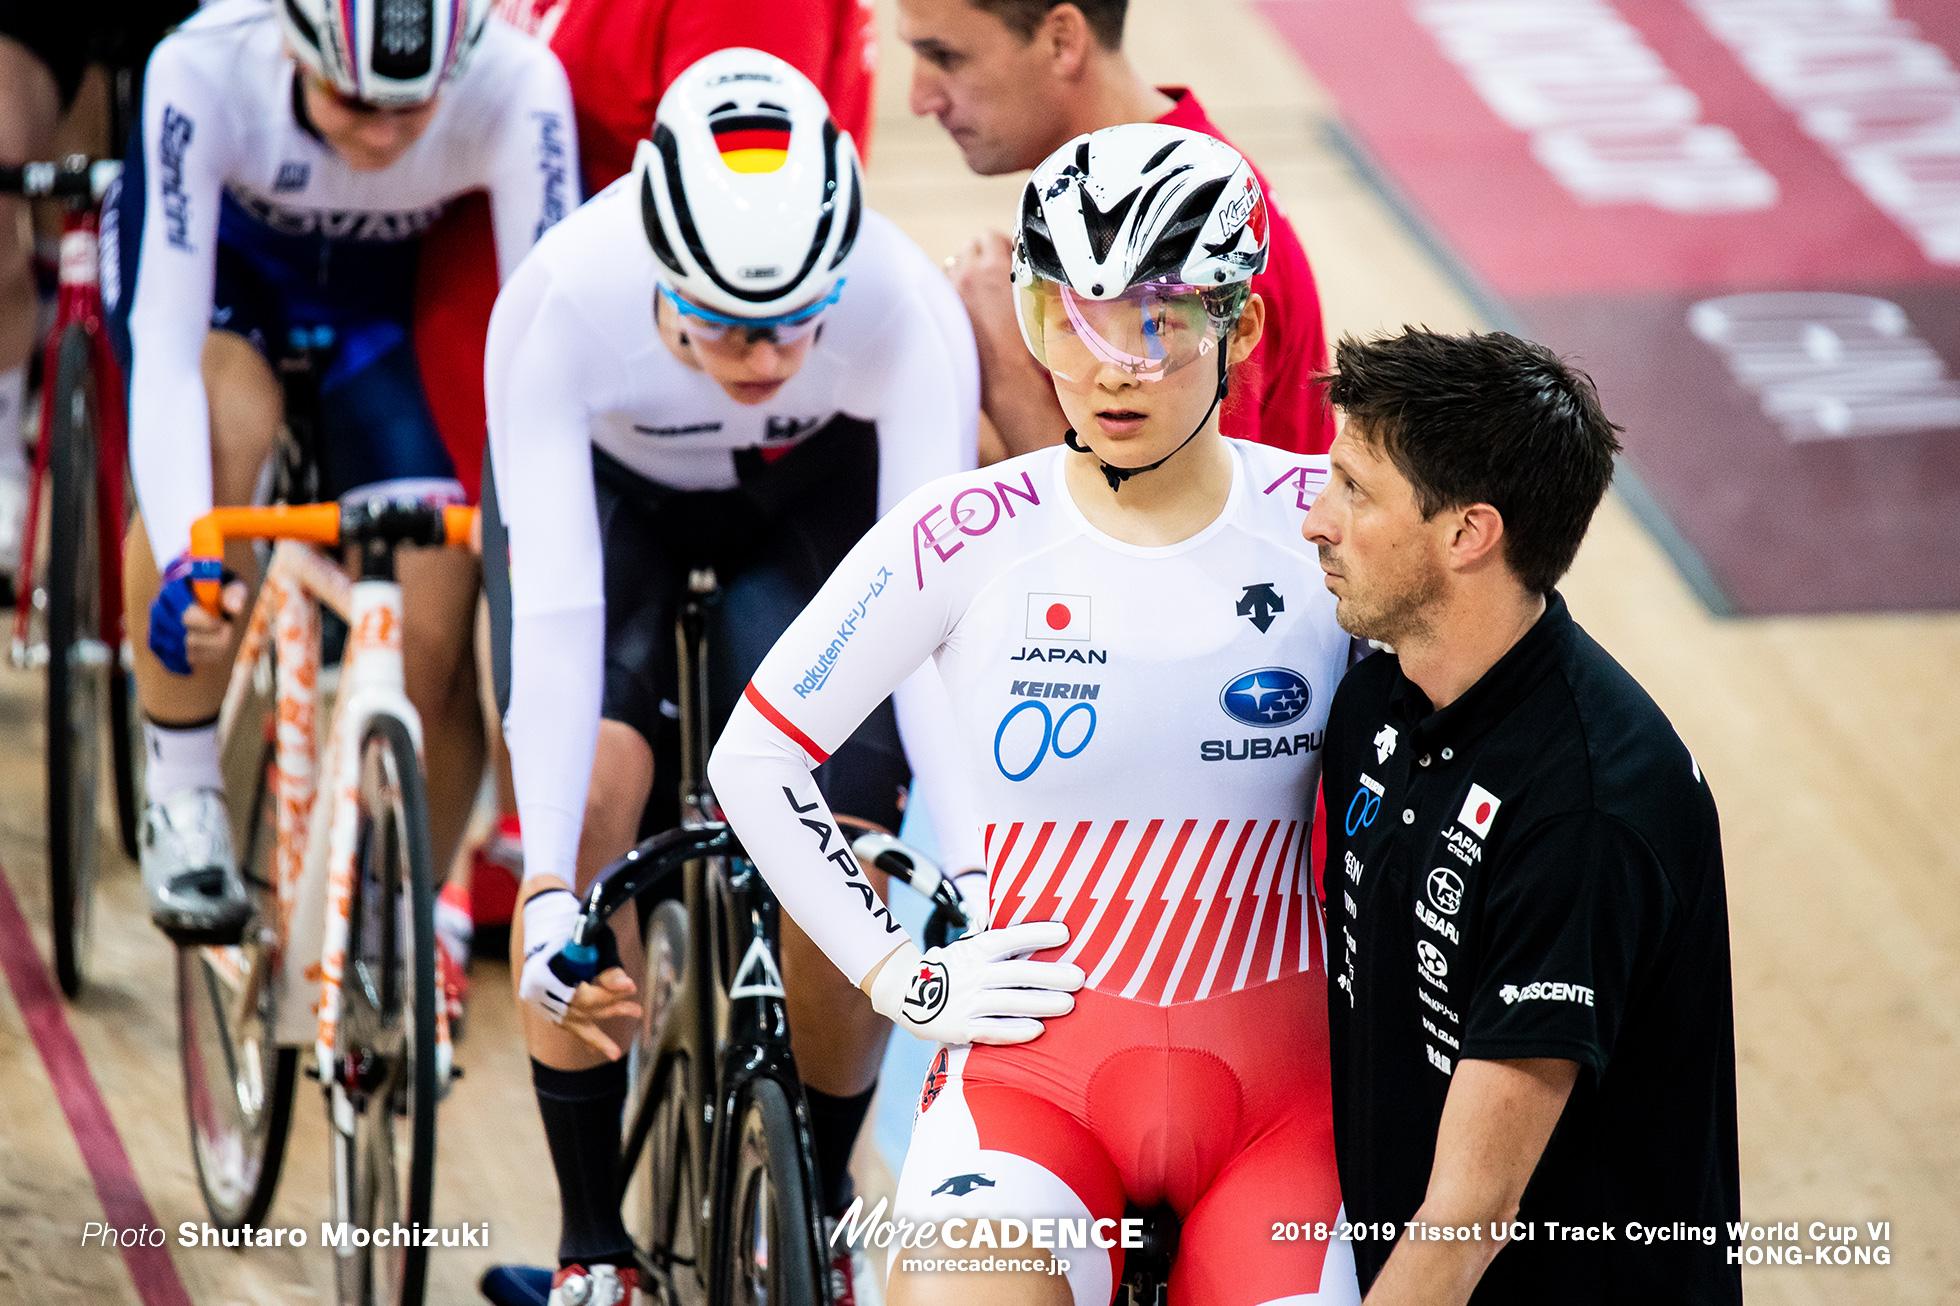 Women's Scratch Race / Track Cycling World Cup VI / Hong-KongOmnium / Track Cycling World Cup VI / Hong-Kong